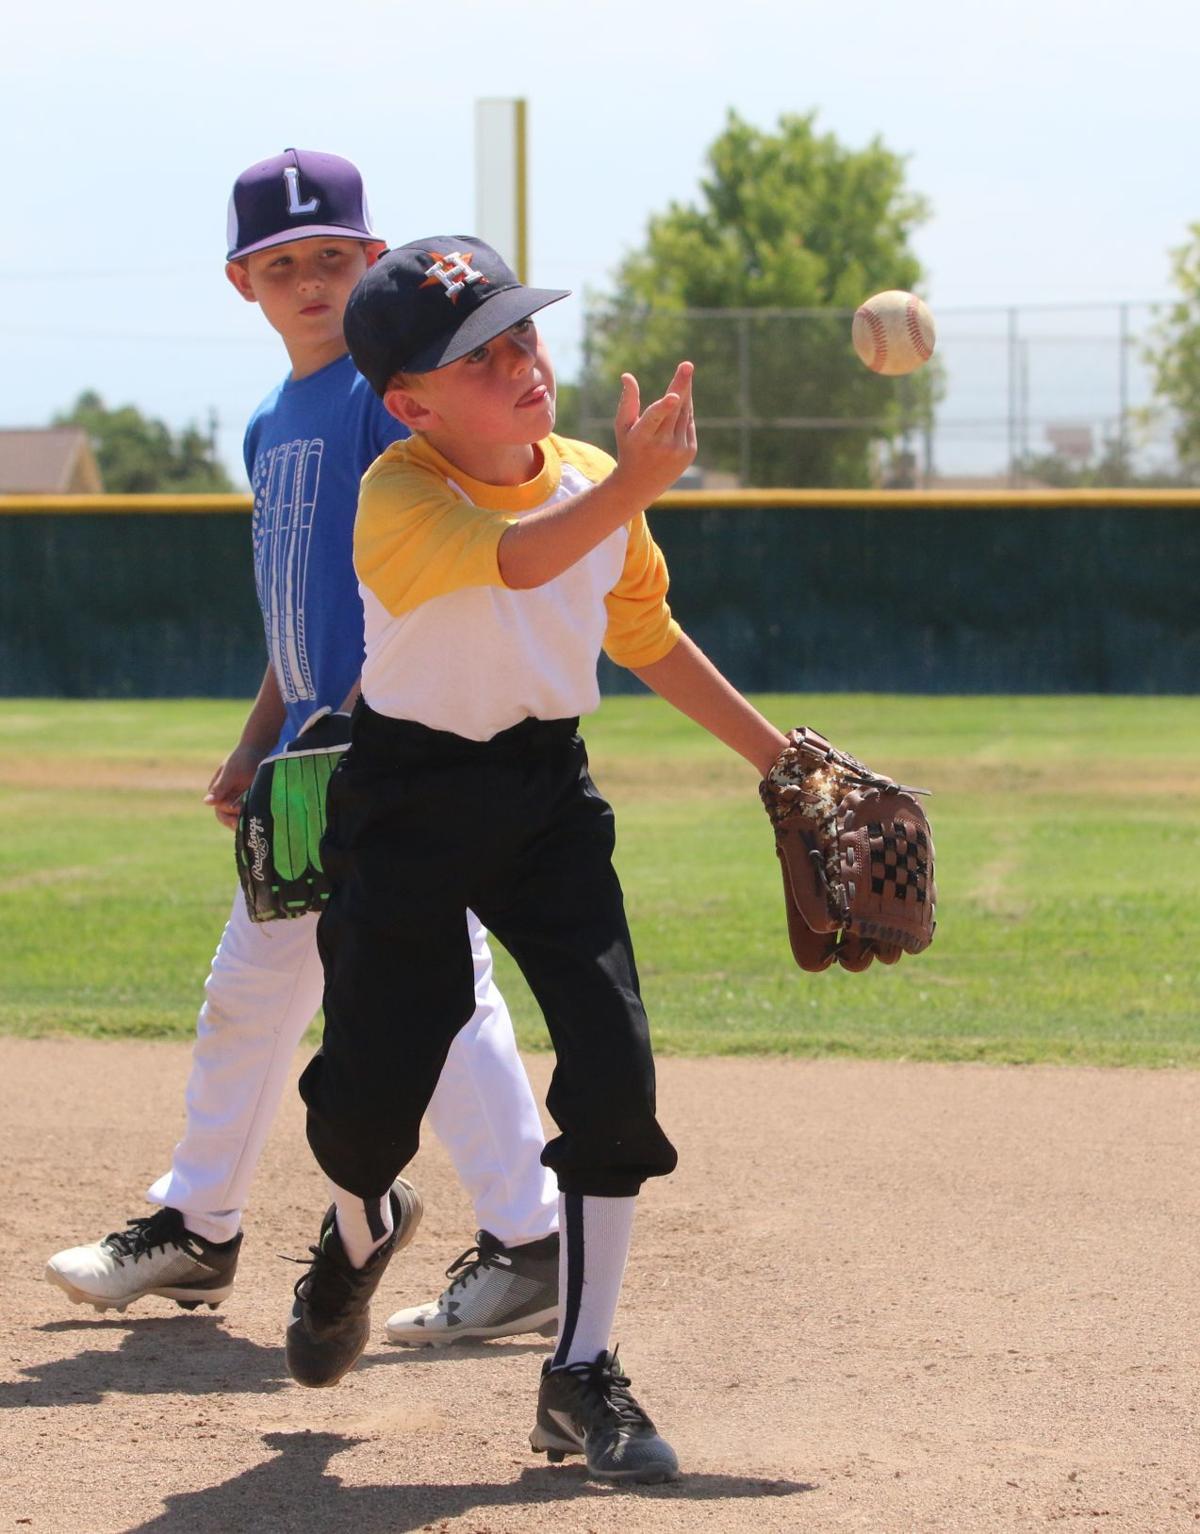 Learning baseball fundamentals